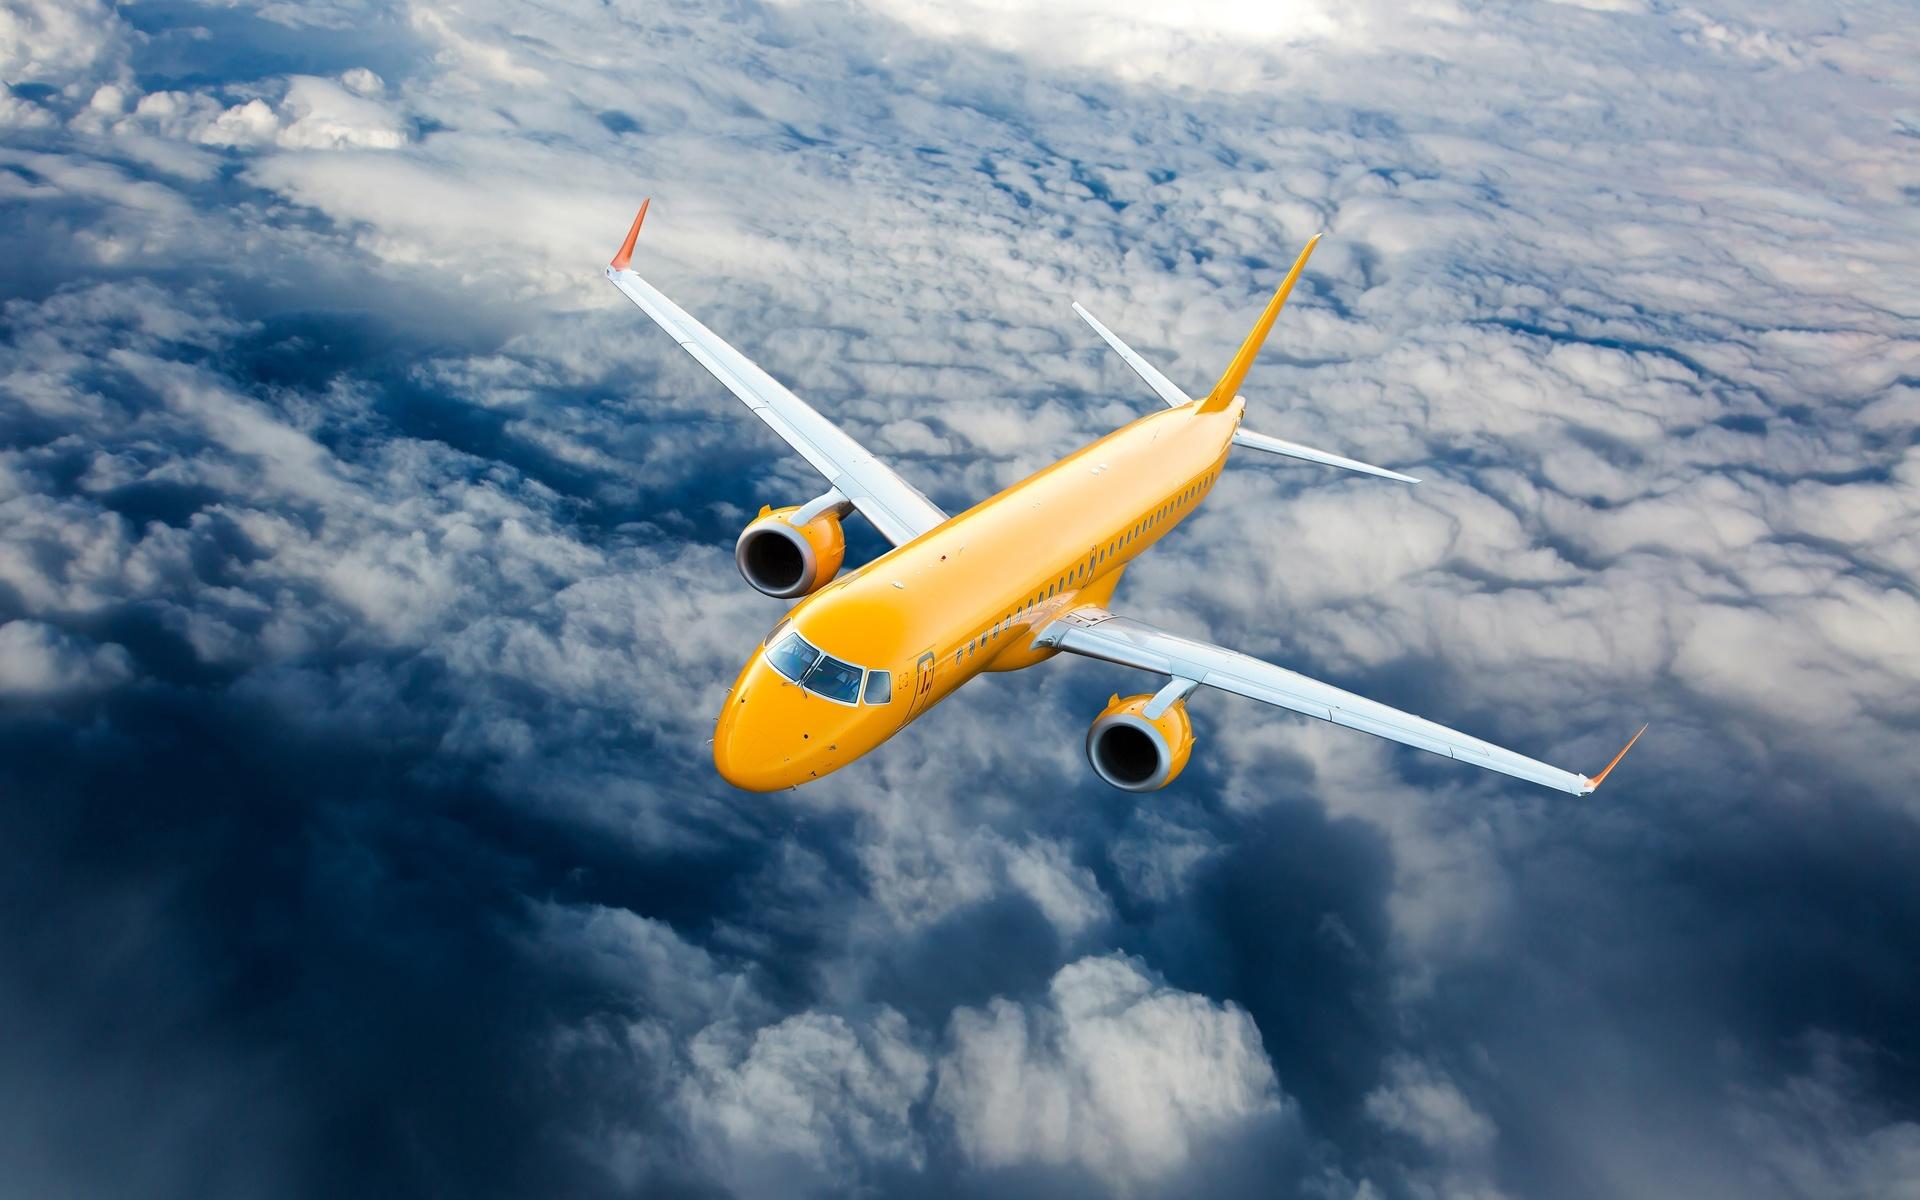 Летающий самолет картинка